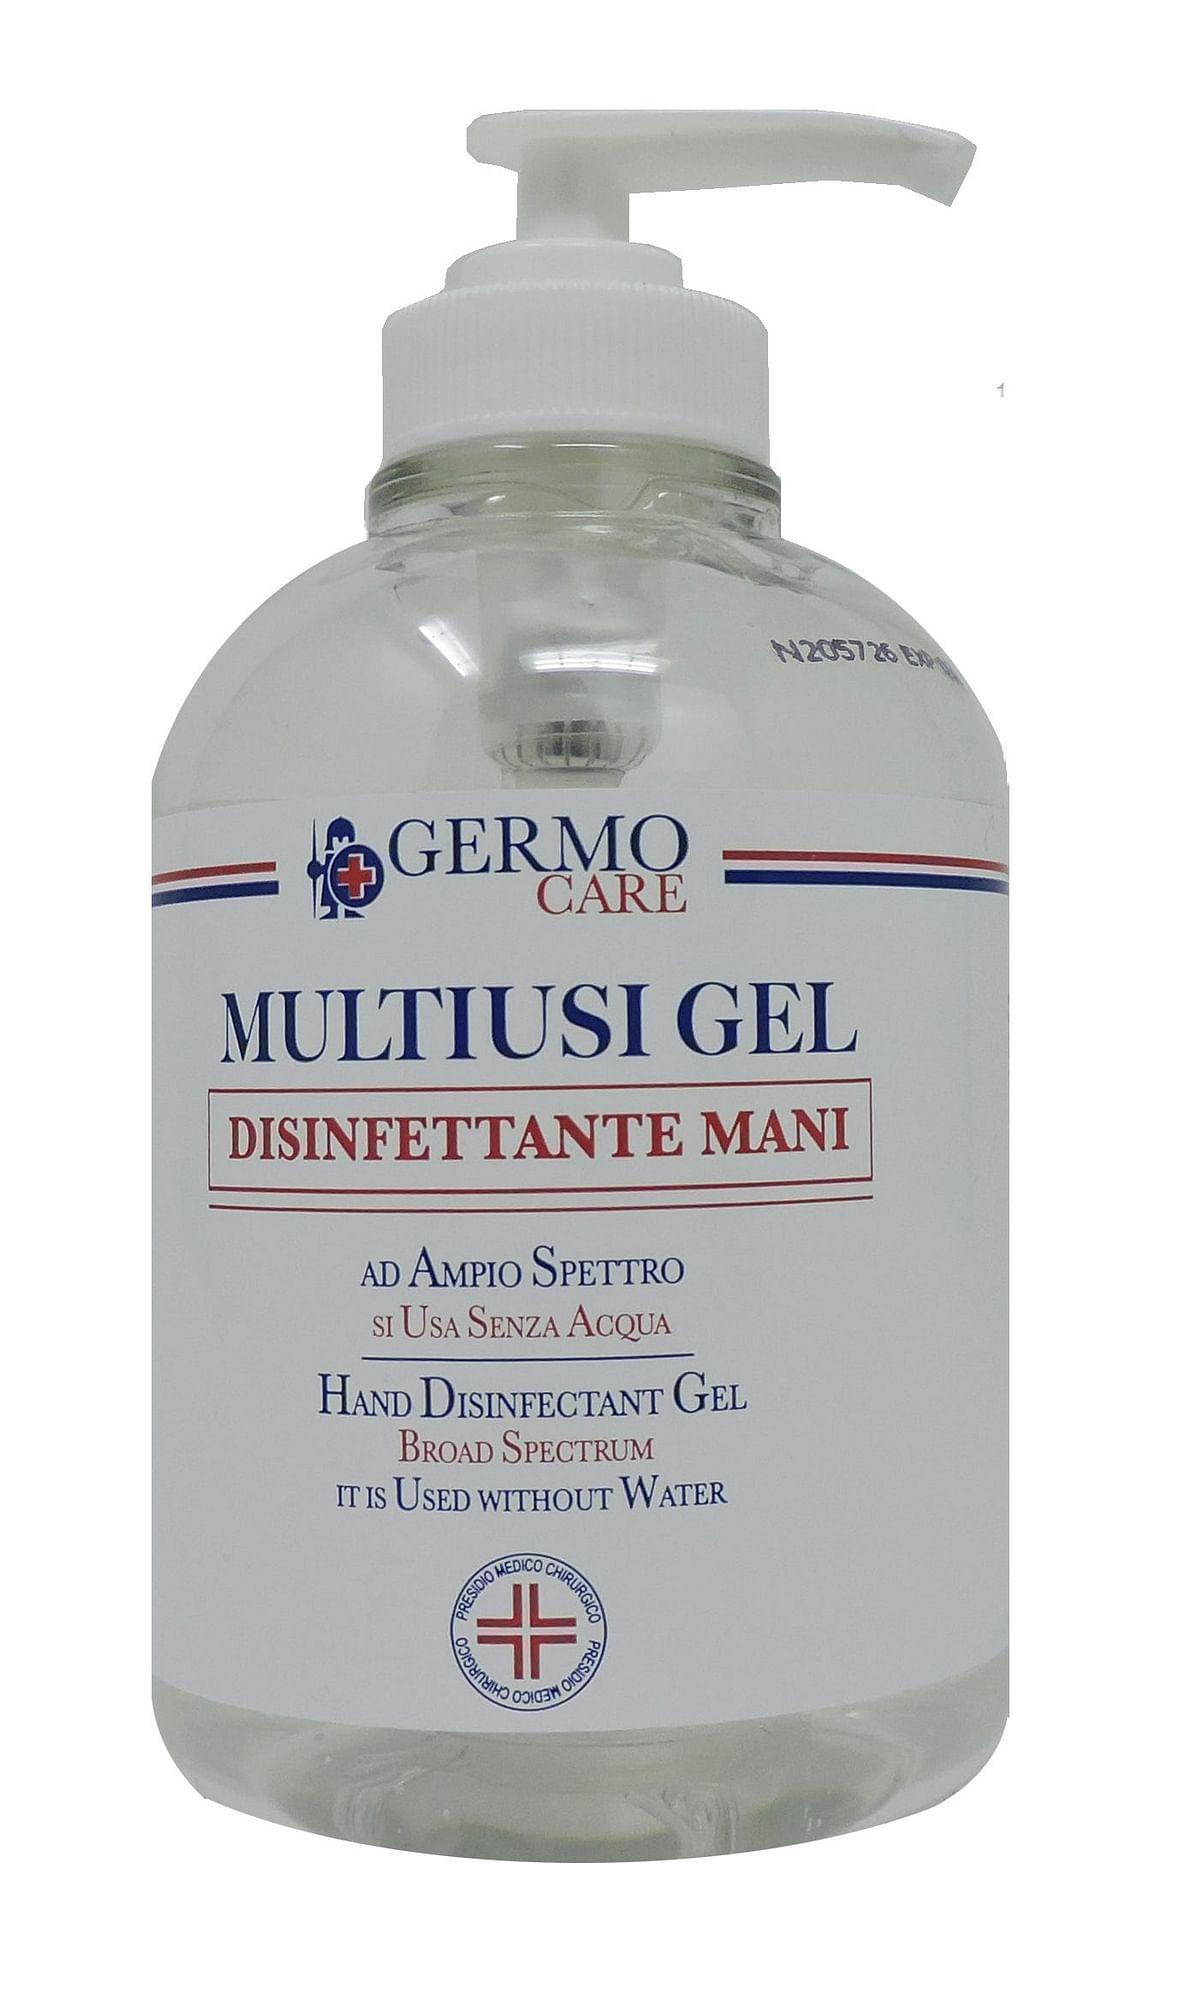 germo multiusi gel disinfettante mani 500 ml